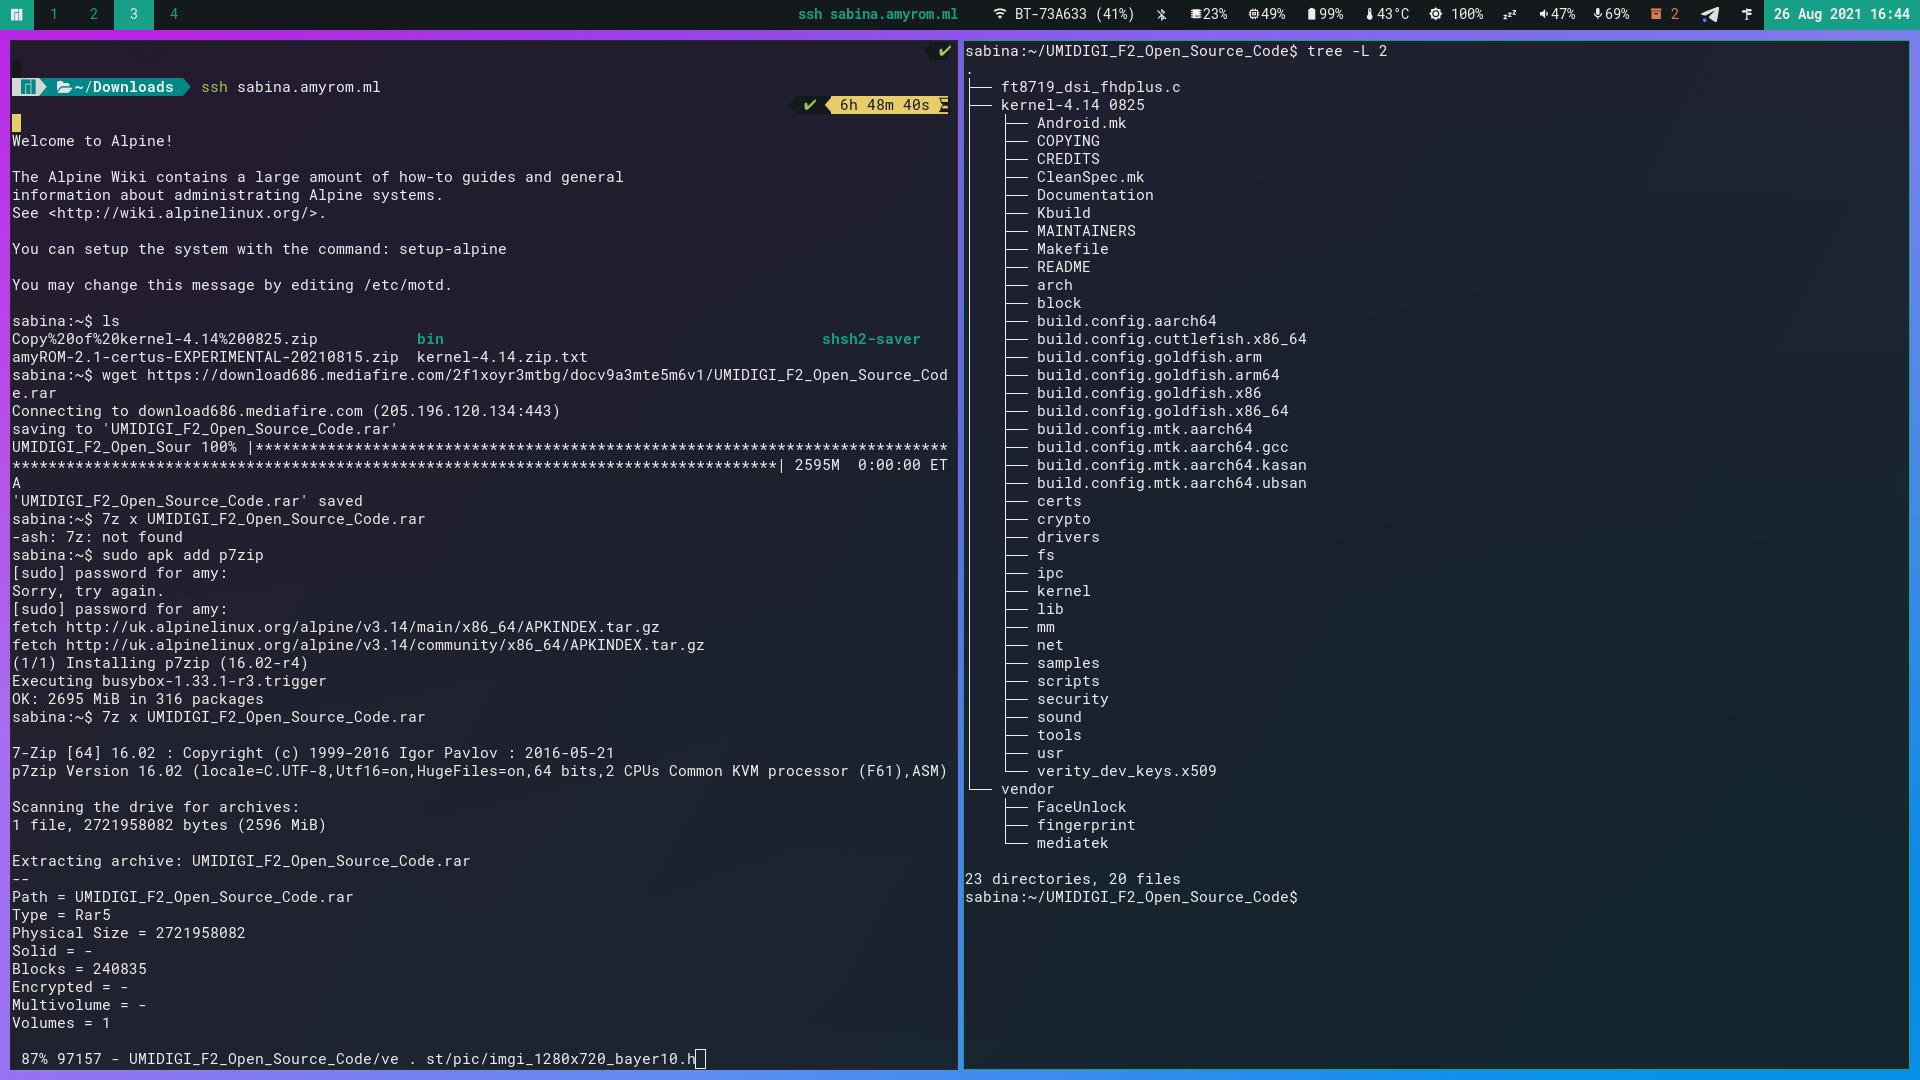 https://cloud-bl63gbyo1-hack-club-bot.vercel.app/020210826_16h44m32s_grim.png